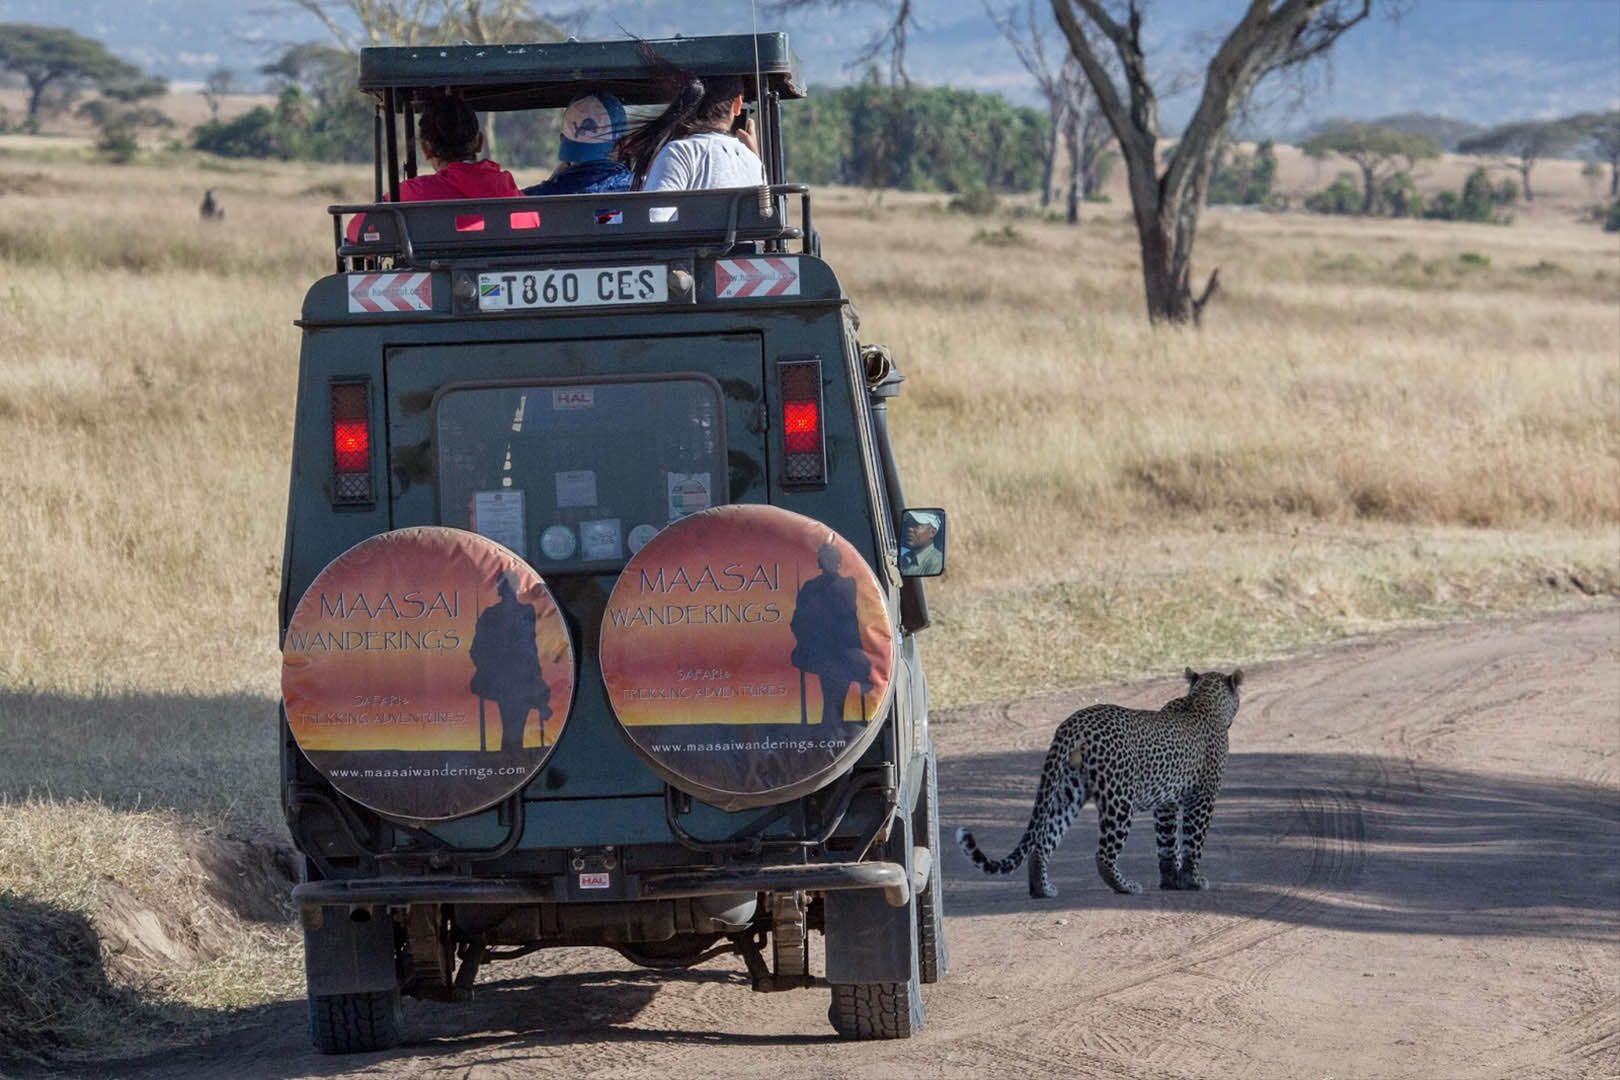 gallery-maasai-wanderings-safari-itineraries-signature-photo-safaris-africa-game-drives